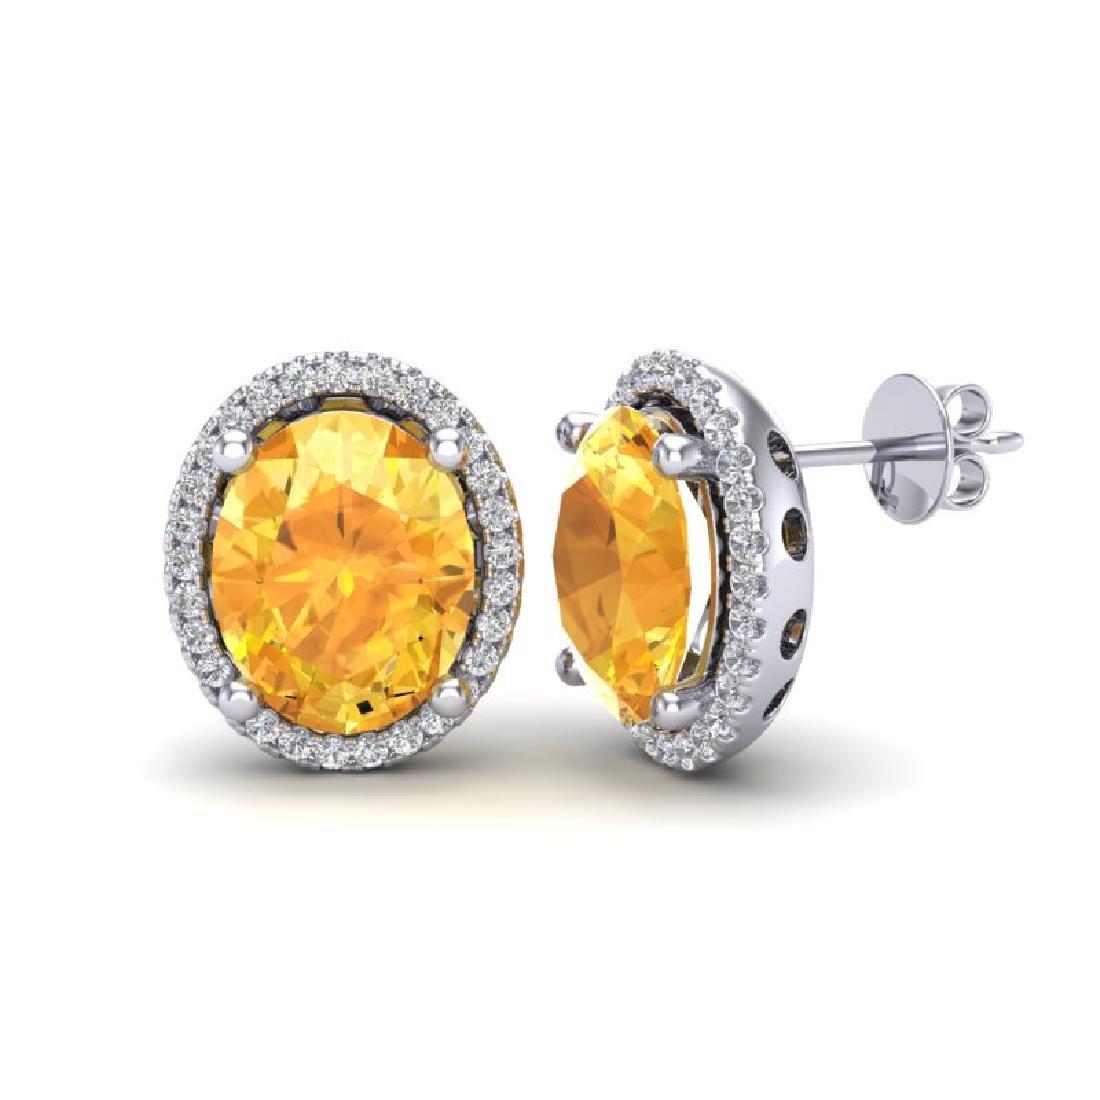 5 CTW Citrine & Micro Pave VS/SI Diamond Earrings Halo - 2